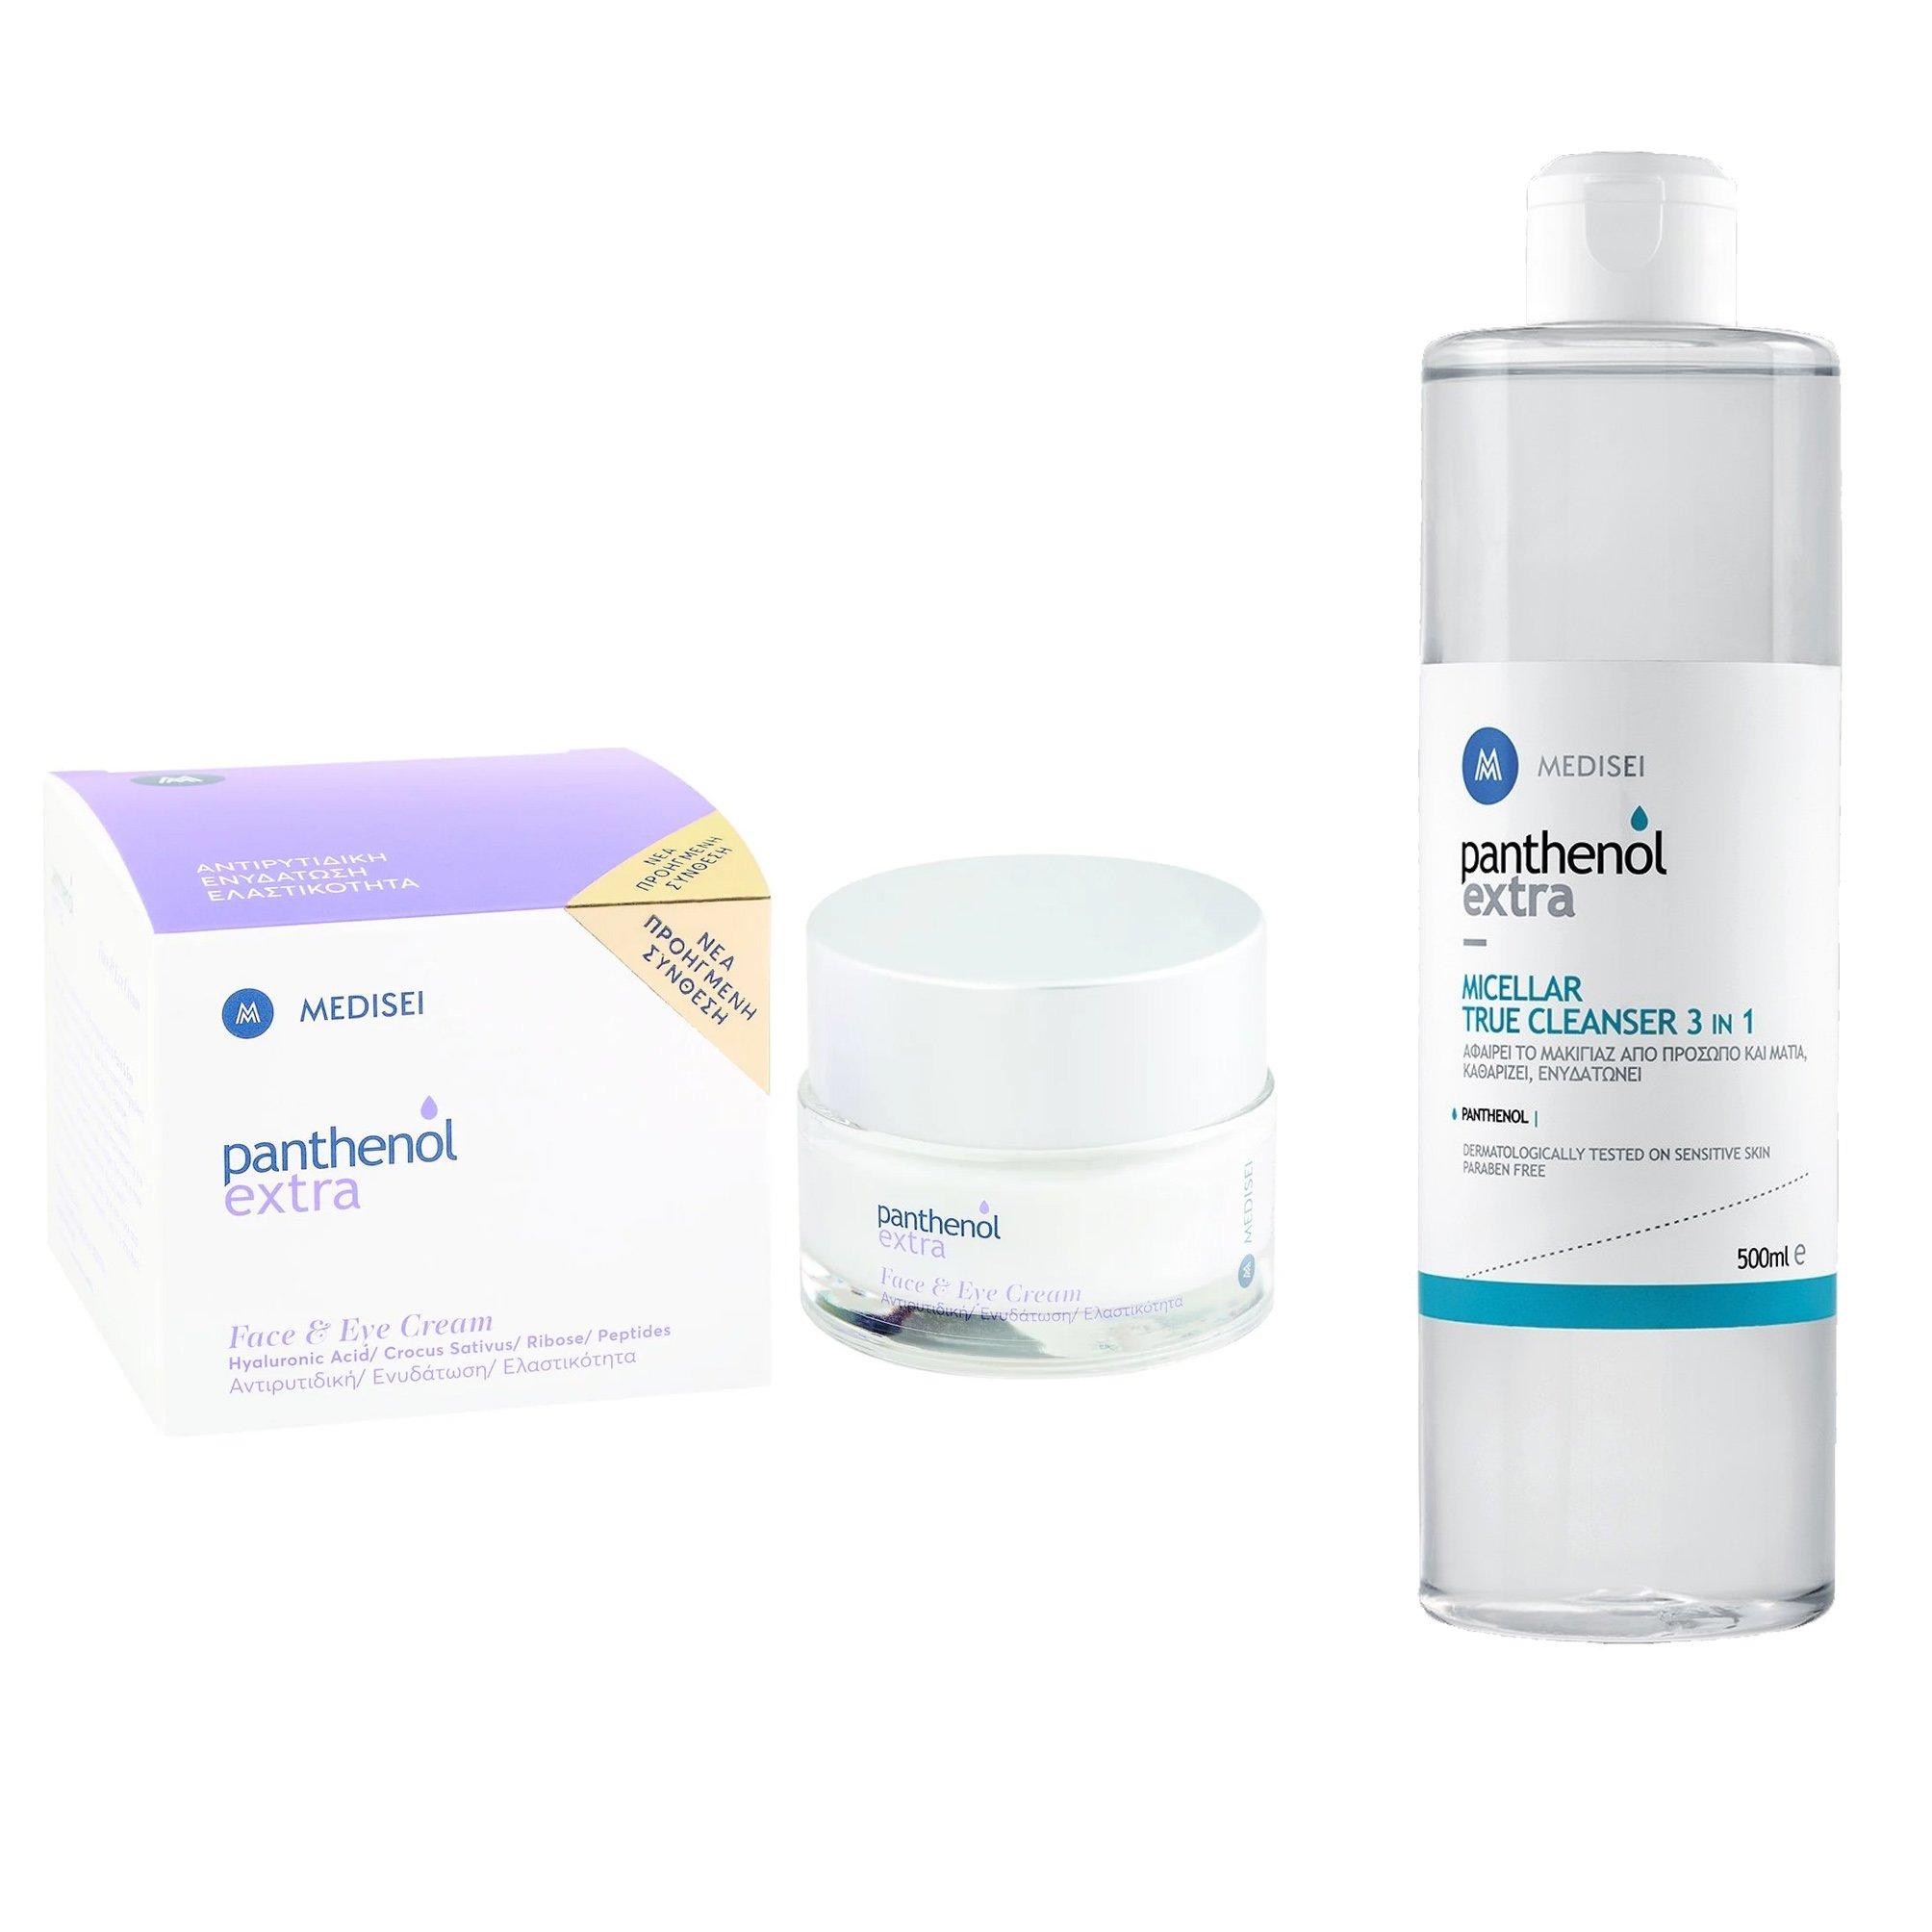 Medisei Panthenol Extra Promo Face & Eye Cream 50ml & Δώρο Micellar True Cleanser 3 in 1 500ml